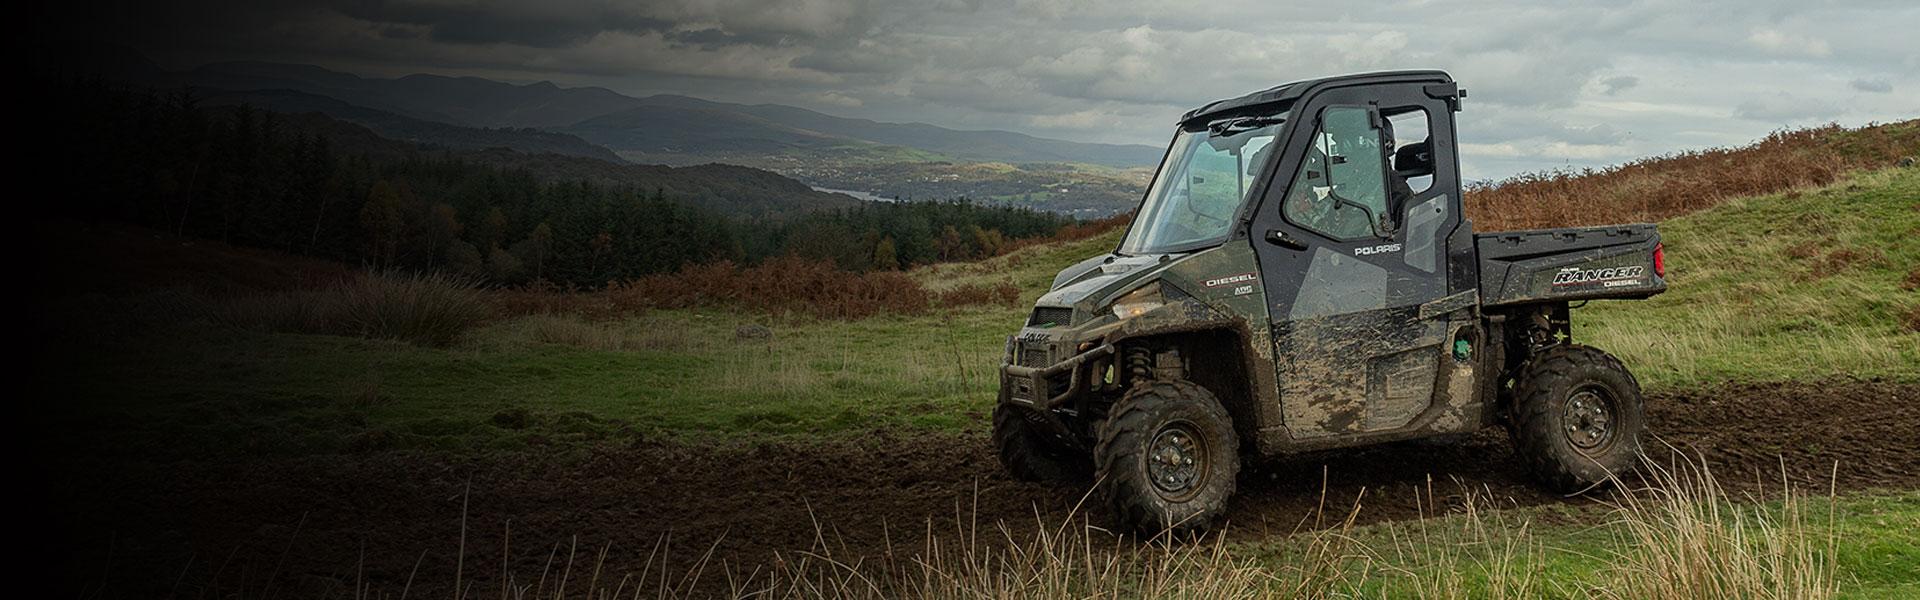 Polaris New Zealand:Ranger® Diesel 1000 HD EPS